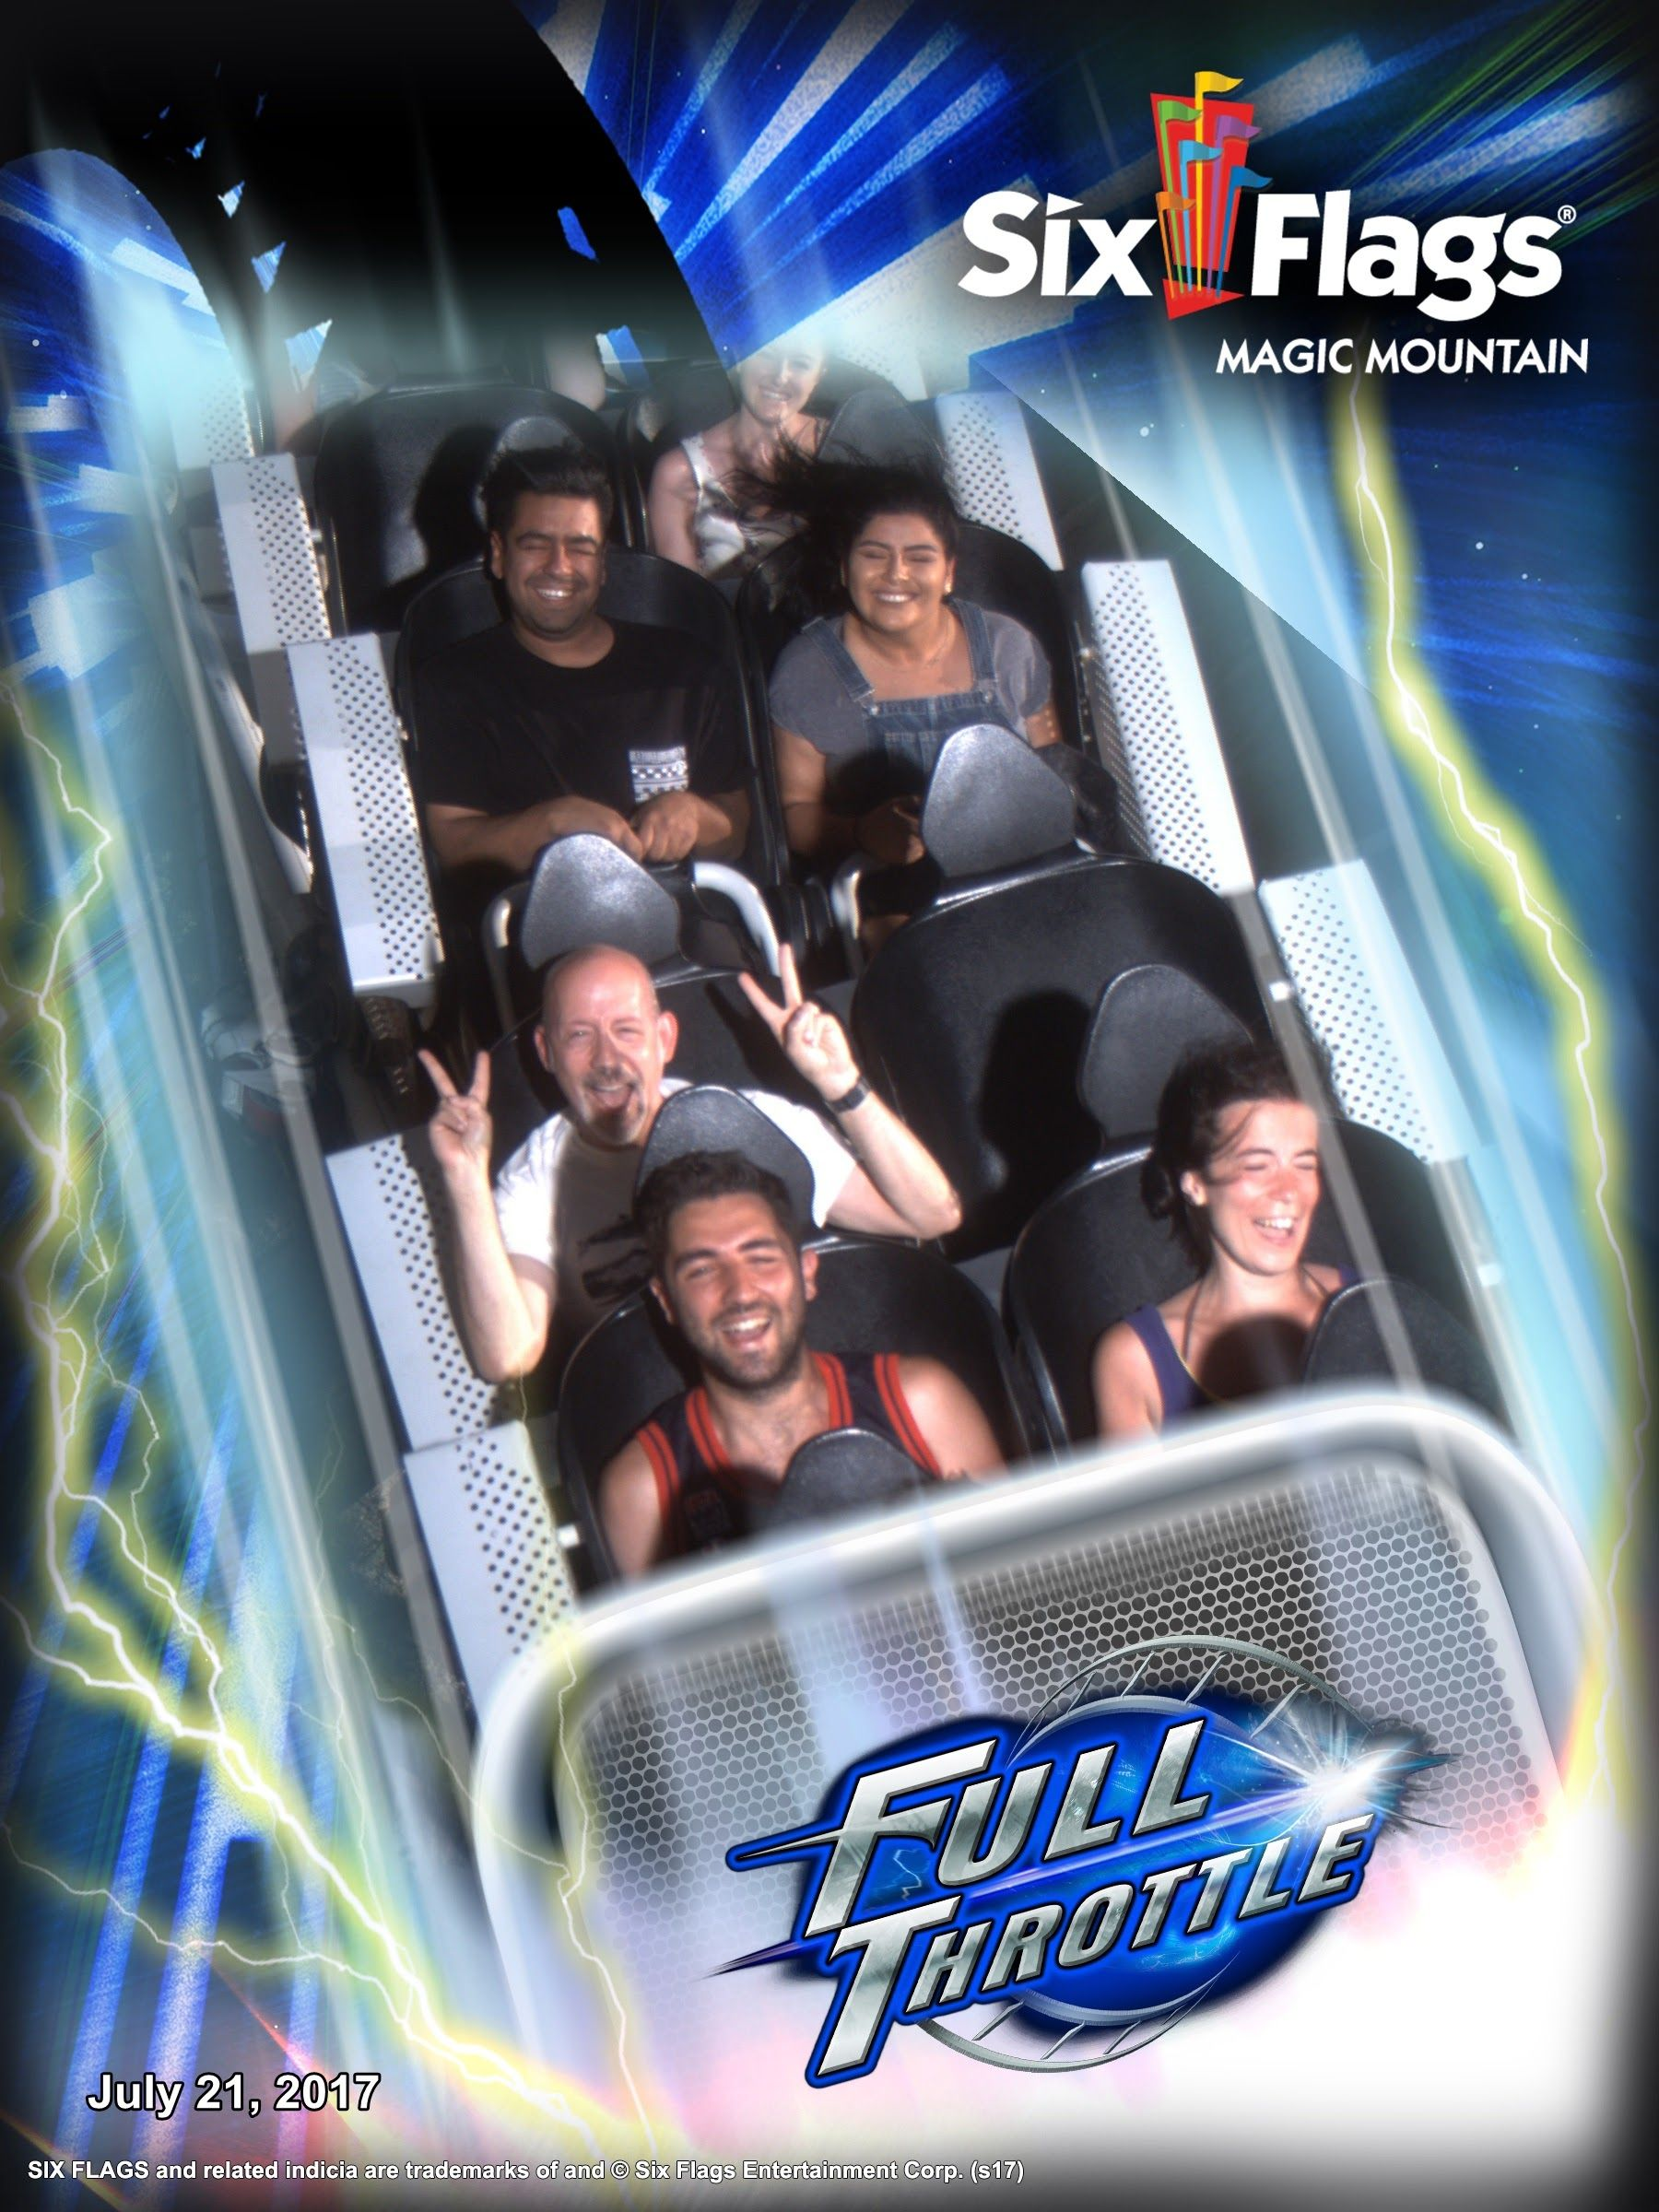 Coasterselfie Sunday Fullthrottle Rollercoaster Themepark Fun Amusementpark Coaster Photography Rollercoasters Thrill Ride Cedar Point Roller Coaster